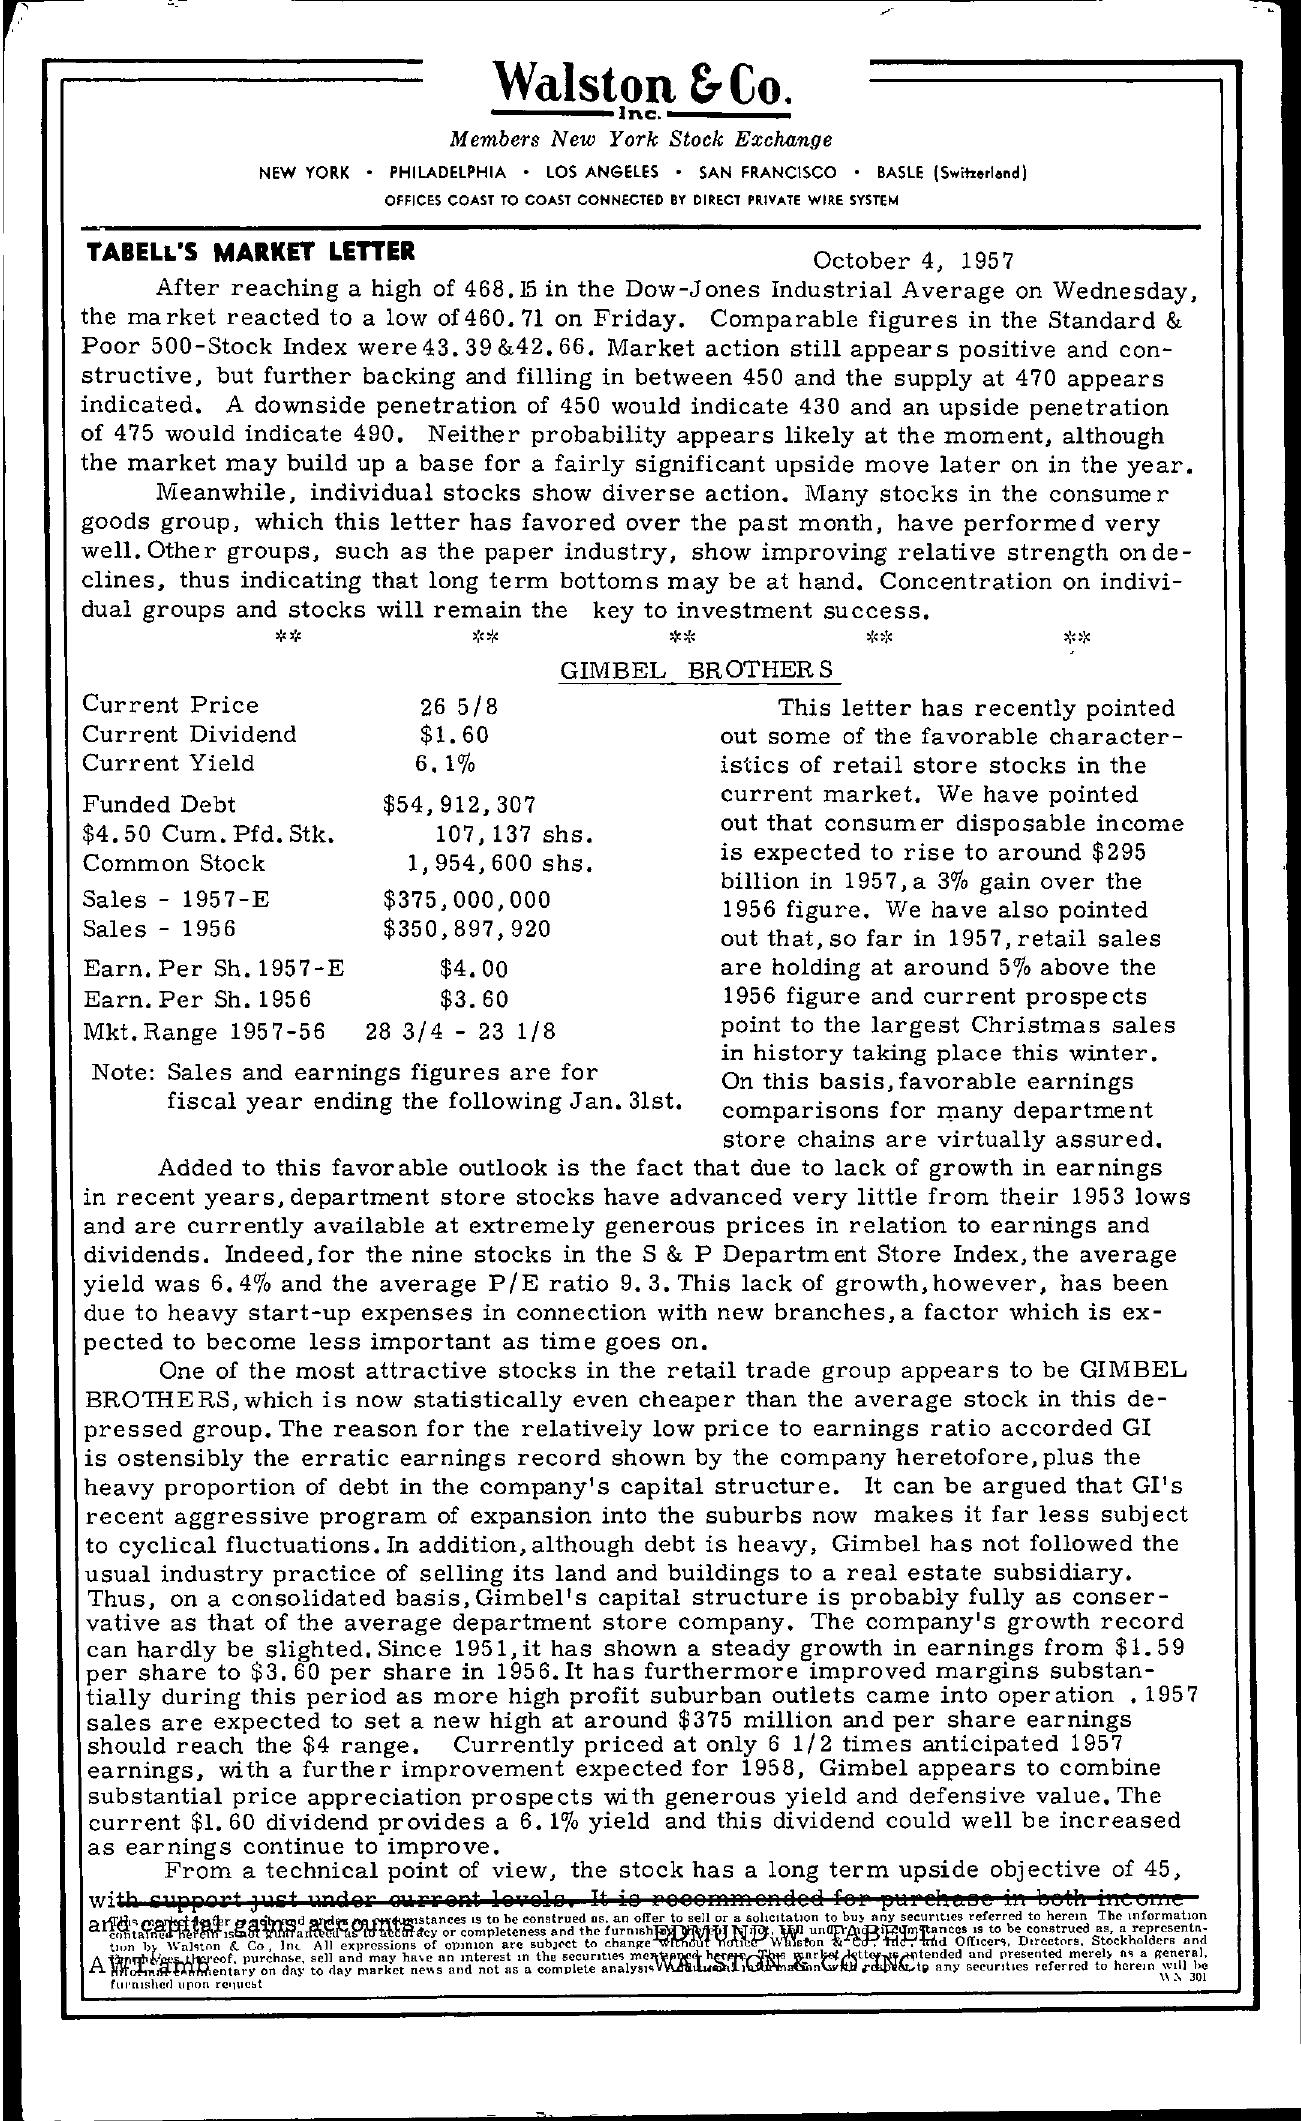 Tabell's Market Letter - October 04, 1957